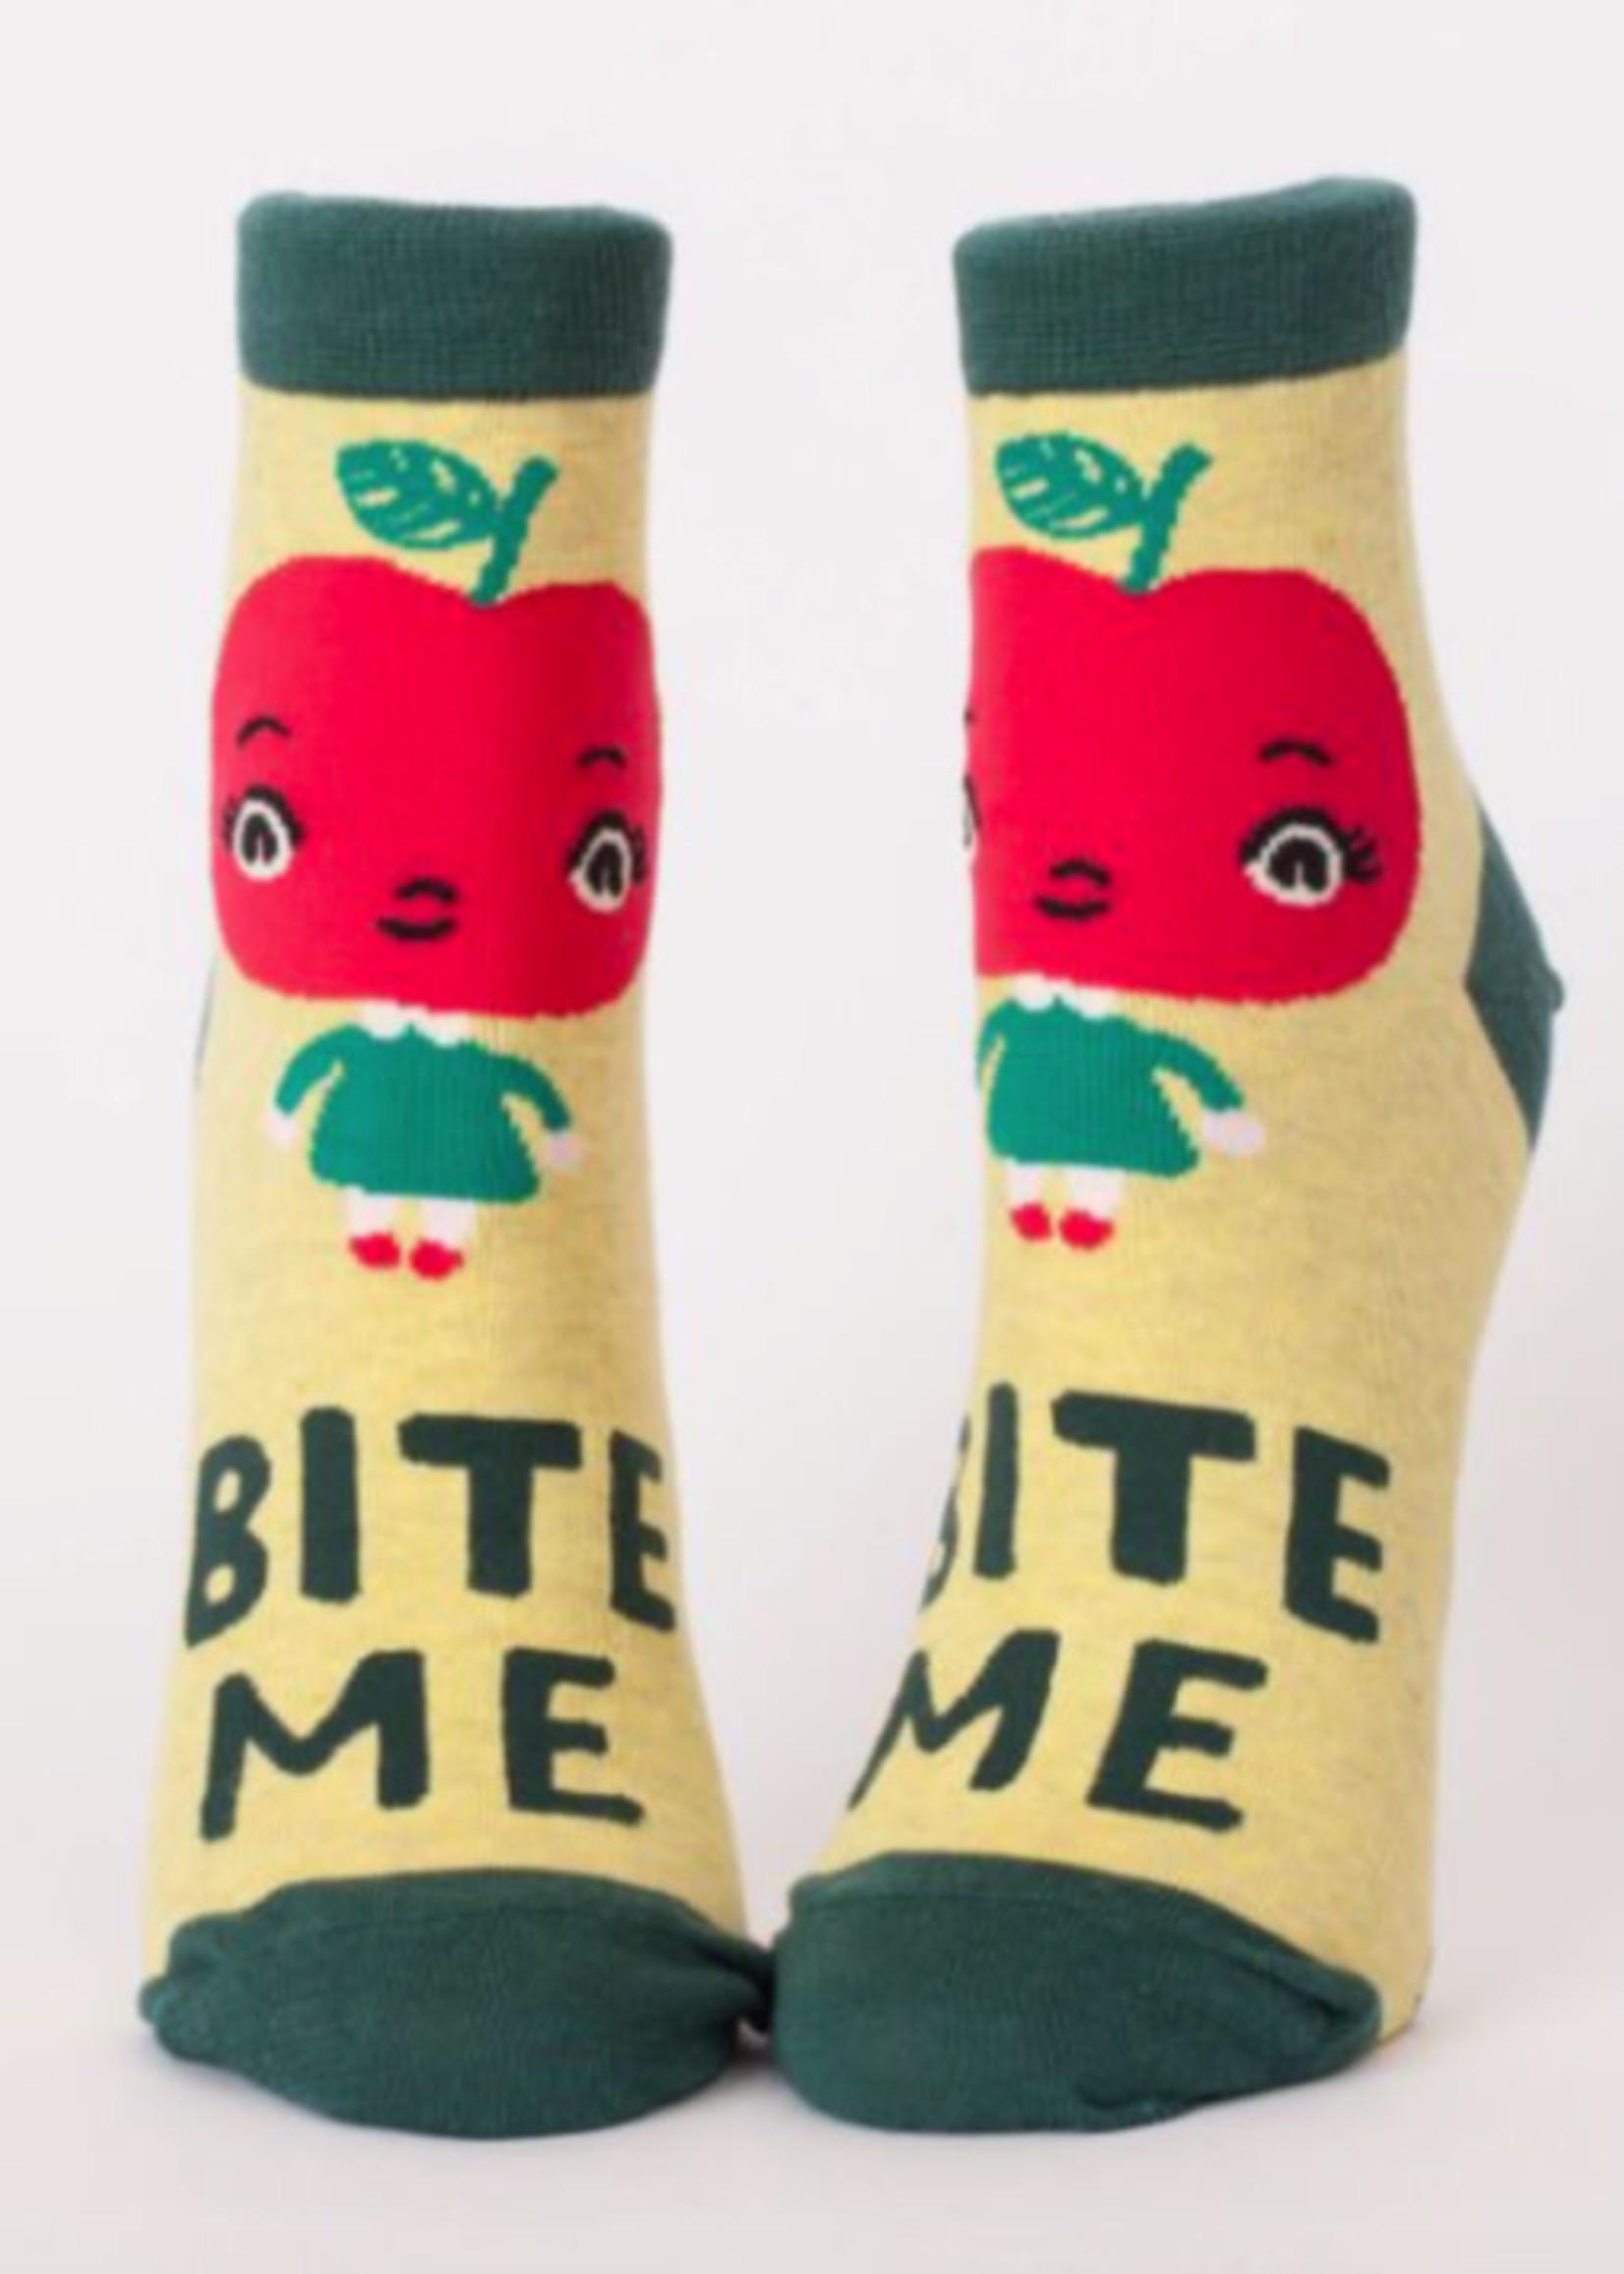 Blue Q Blue Q Ankle Socks Bite Me